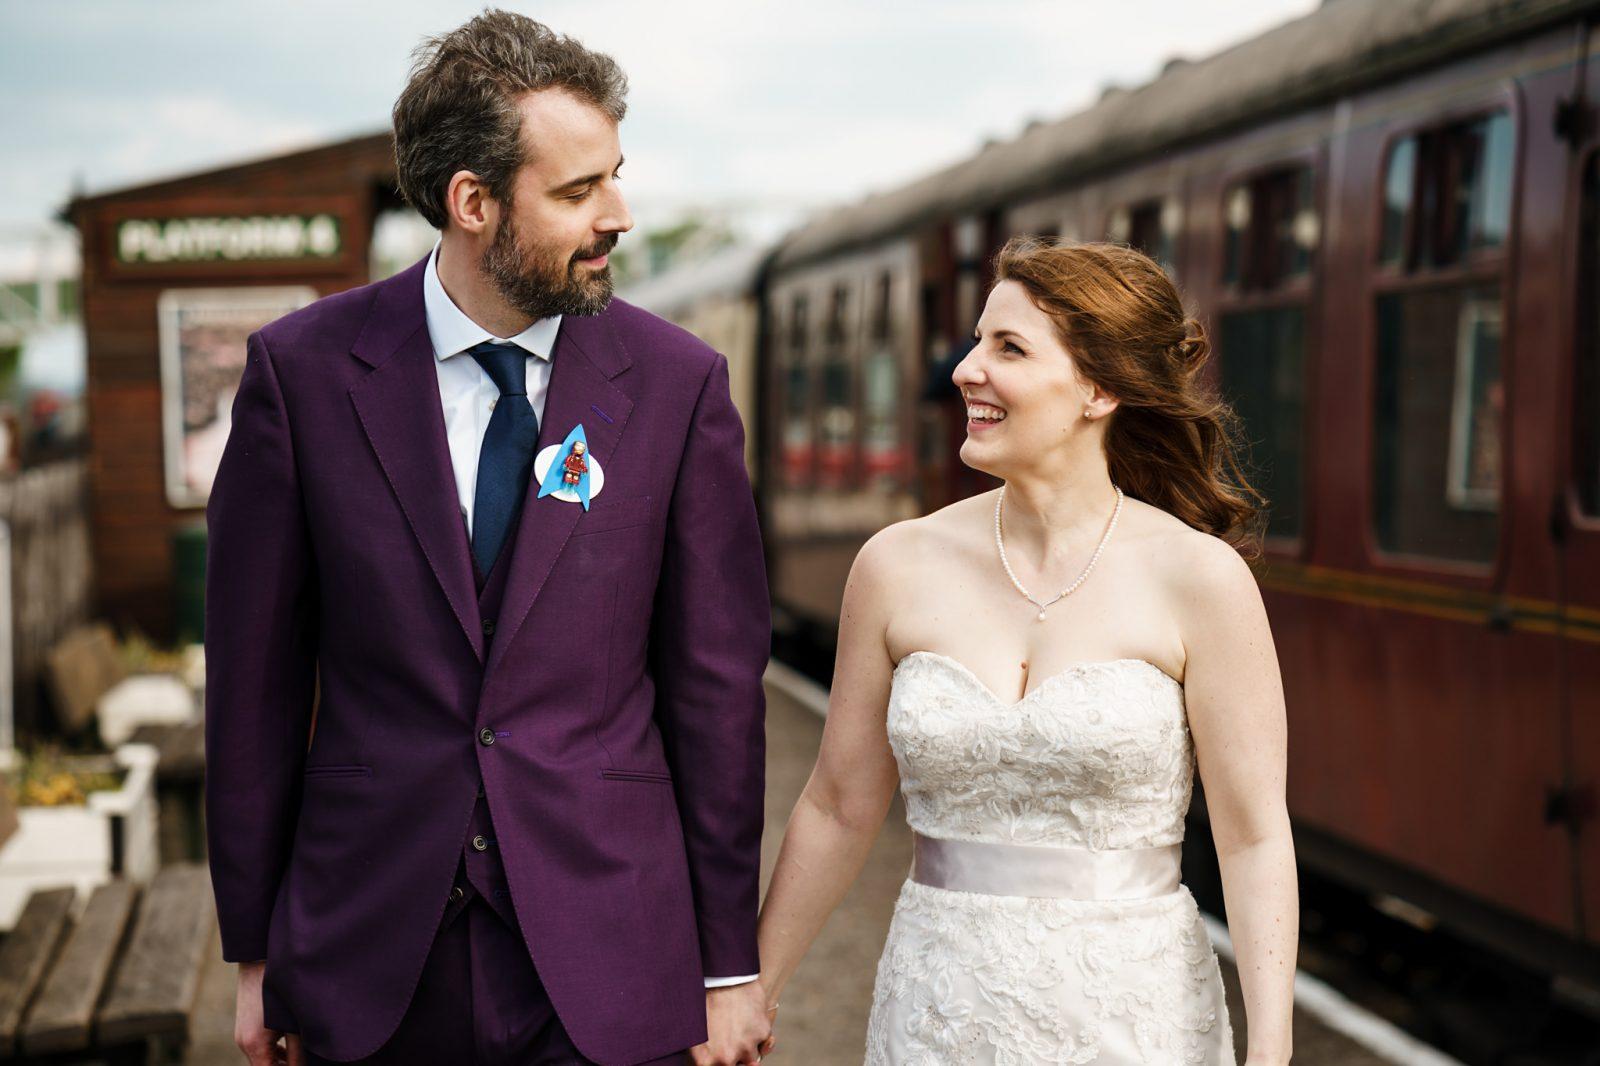 Buckinghamshire-Railway-Centre-wedding-bride-groom-walking